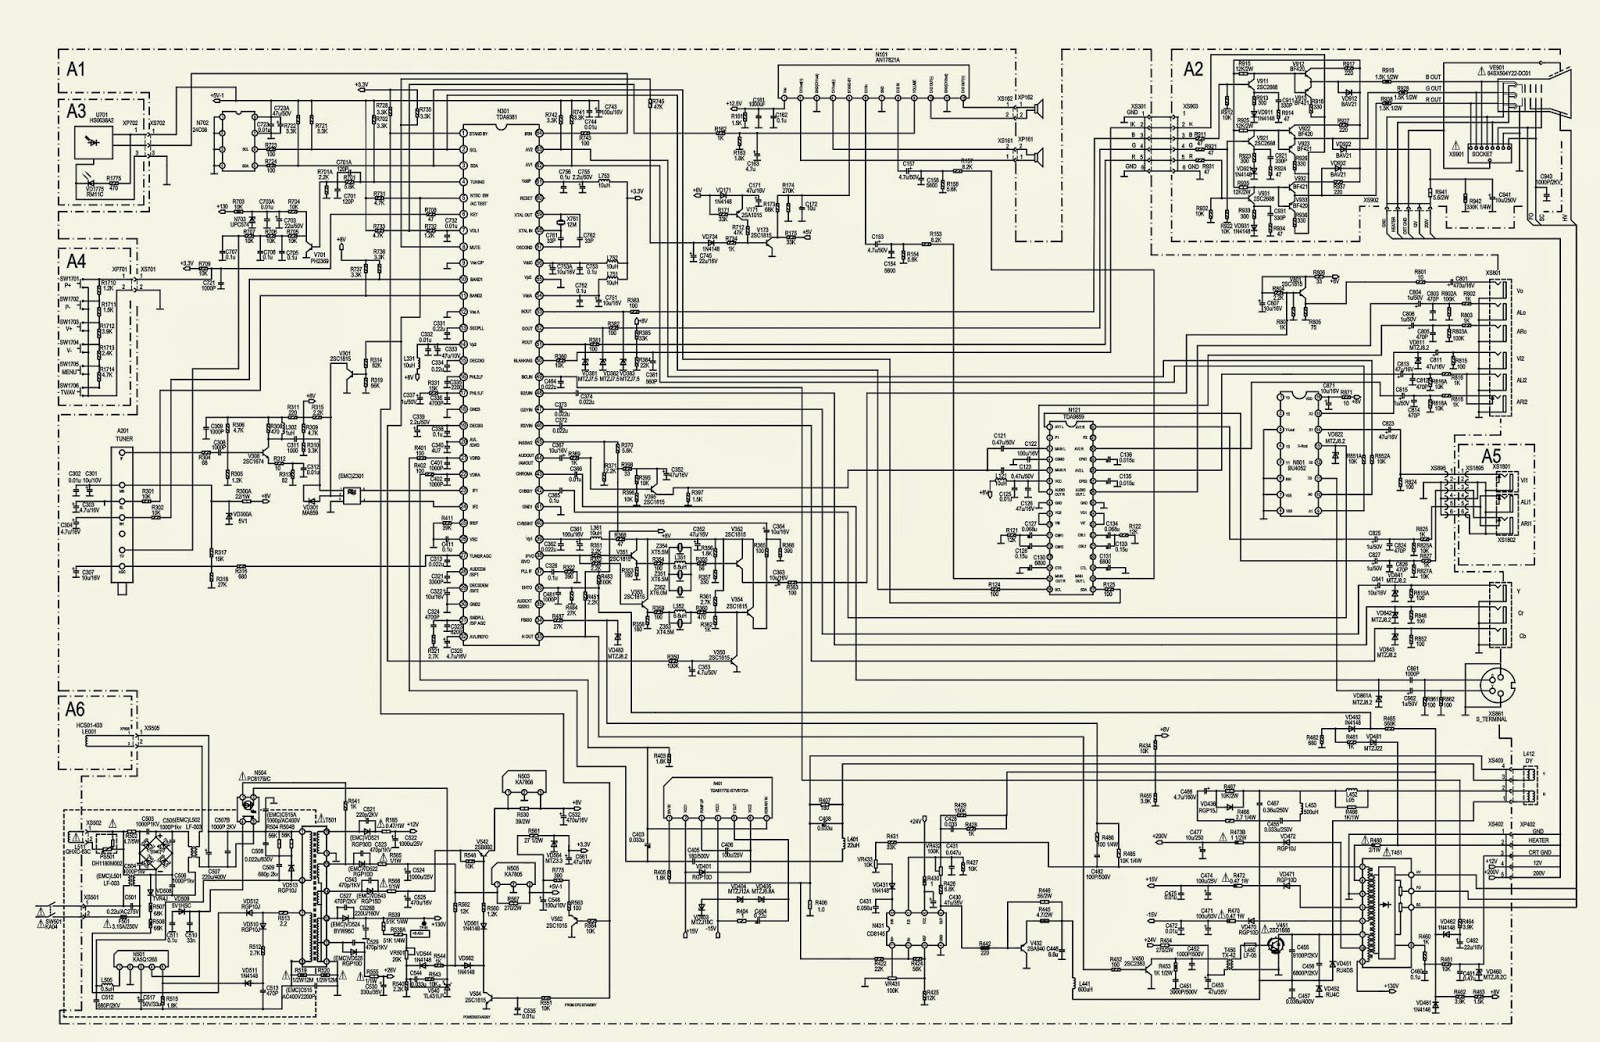 samsung crt tv circuit diagram samsung image colour tv circuit diagram the wiring diagram on samsung schematic j info [ 1600 x 1042 Pixel ]